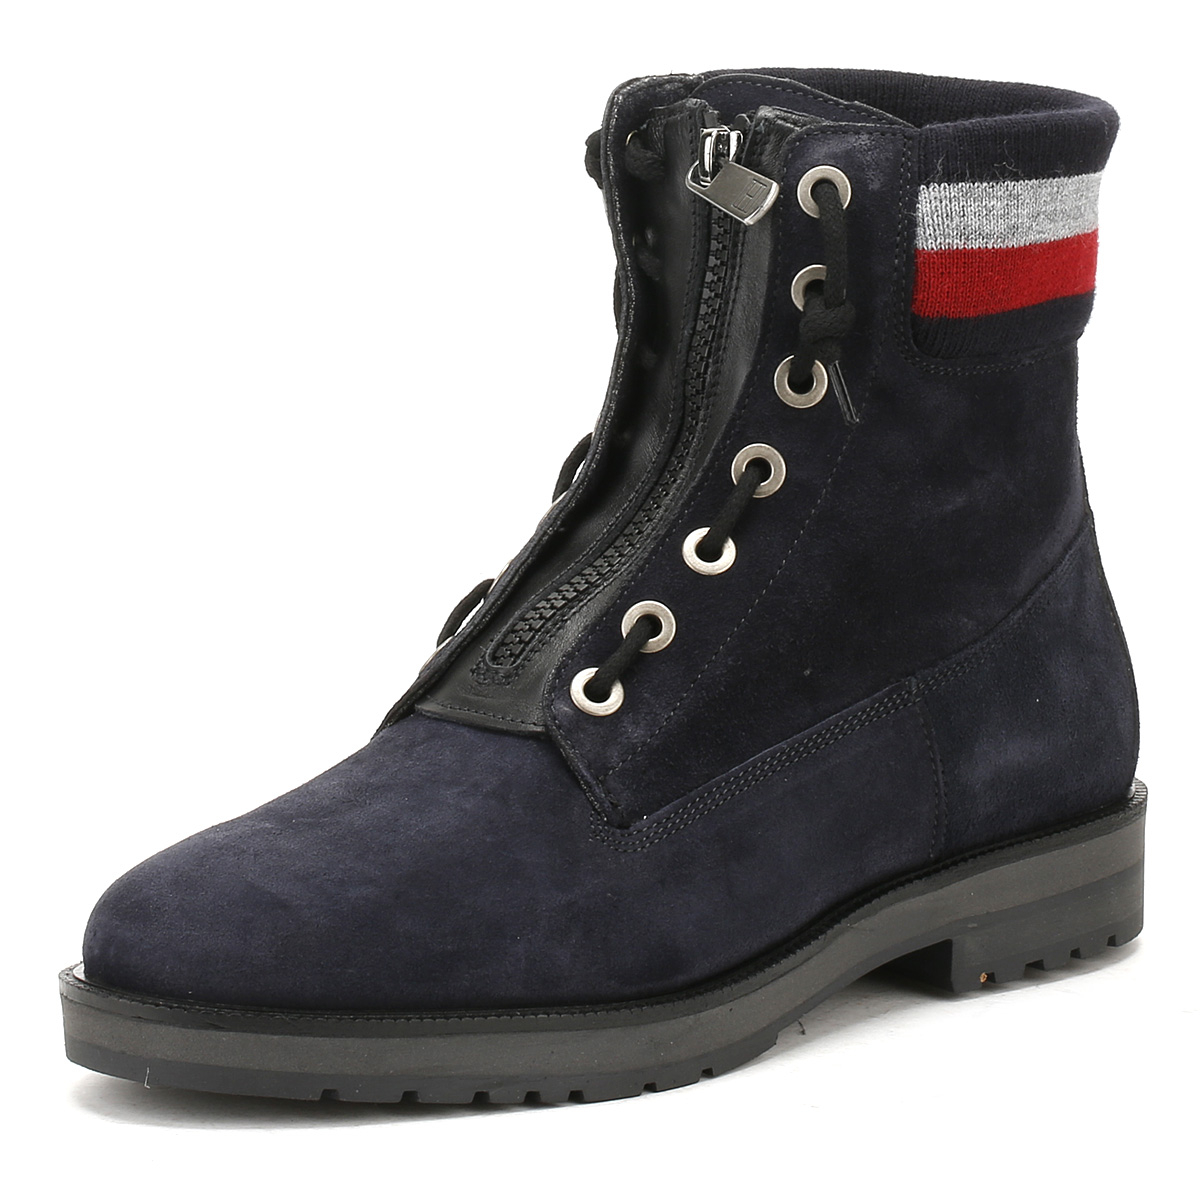 3631d227 Tommy Hilfiger Womens Blue West 9B1 Ankle Boots, Premium Suede ...